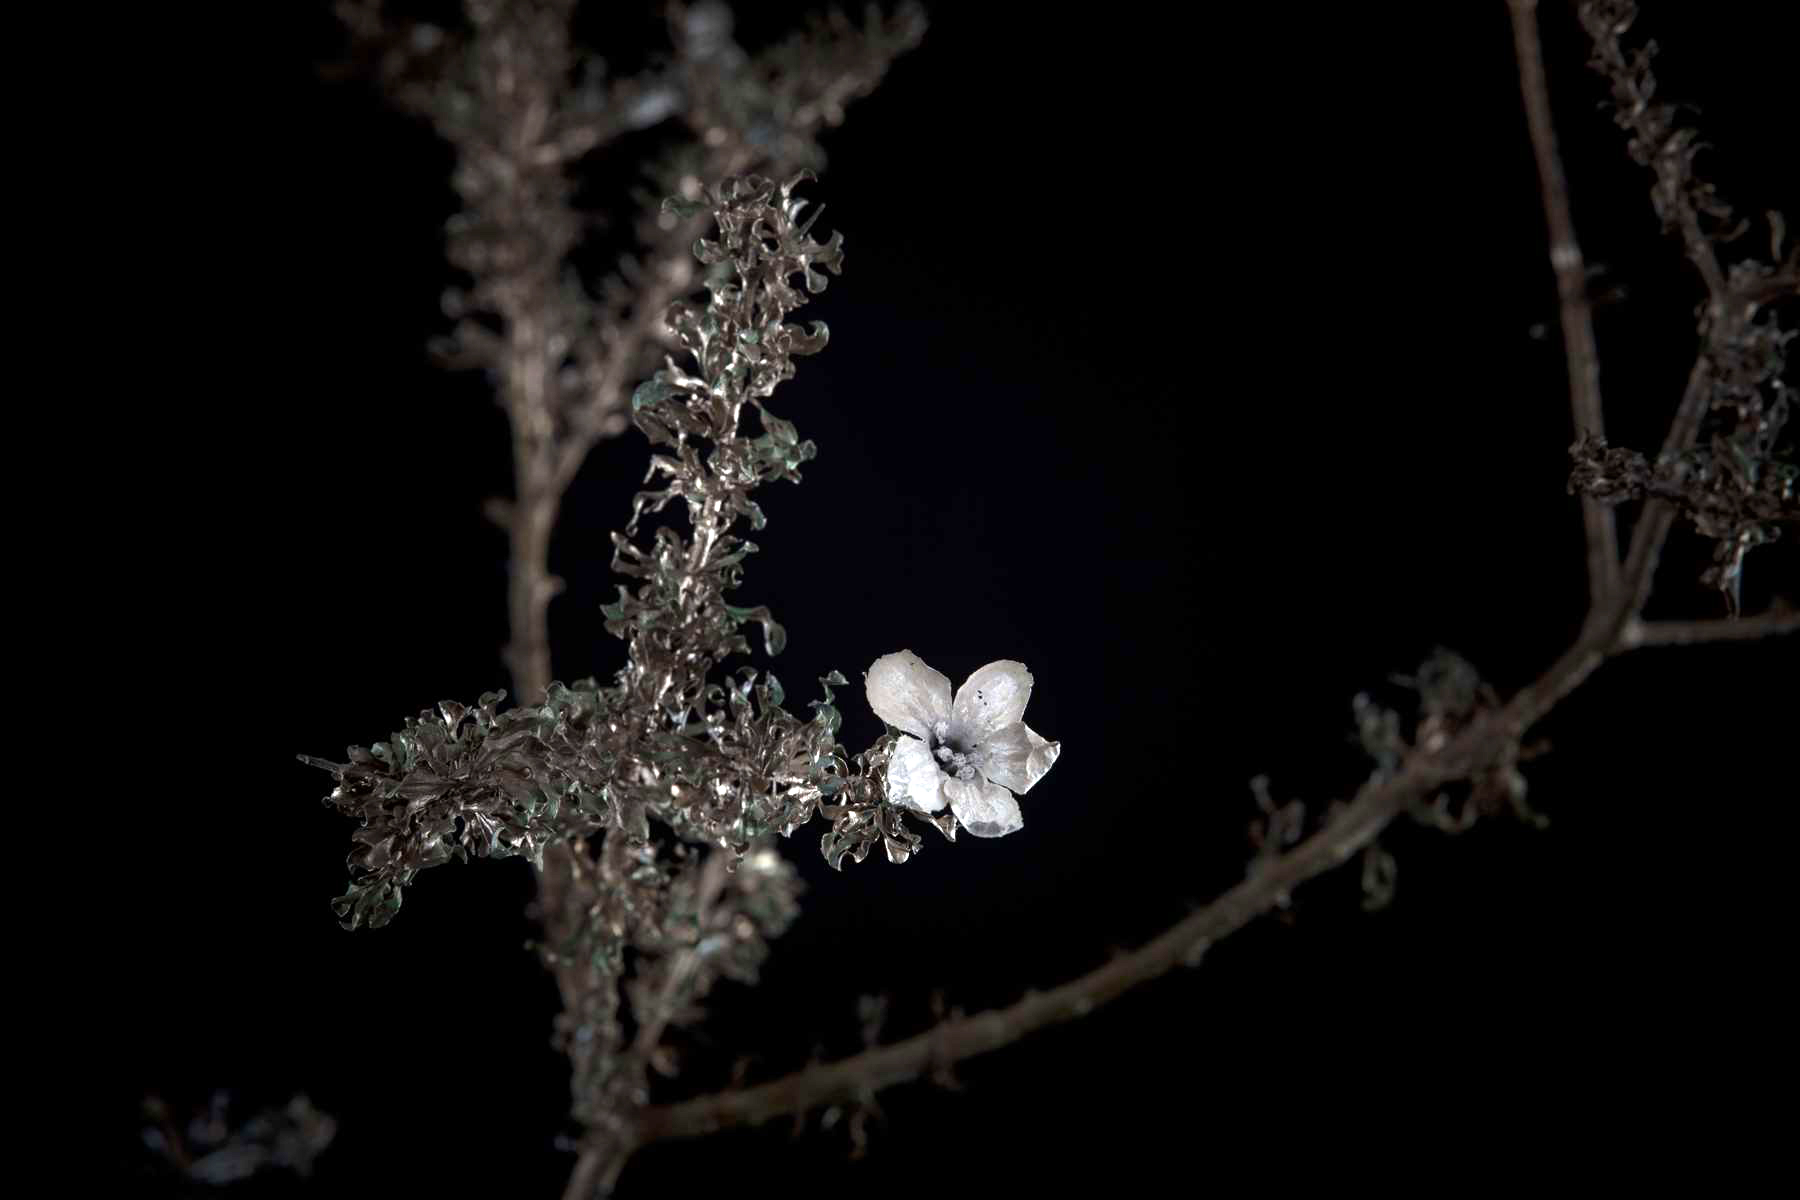 NicBladen_Botanicals_Three Thorn, Driedoring, Mokuburwane-092.jpg